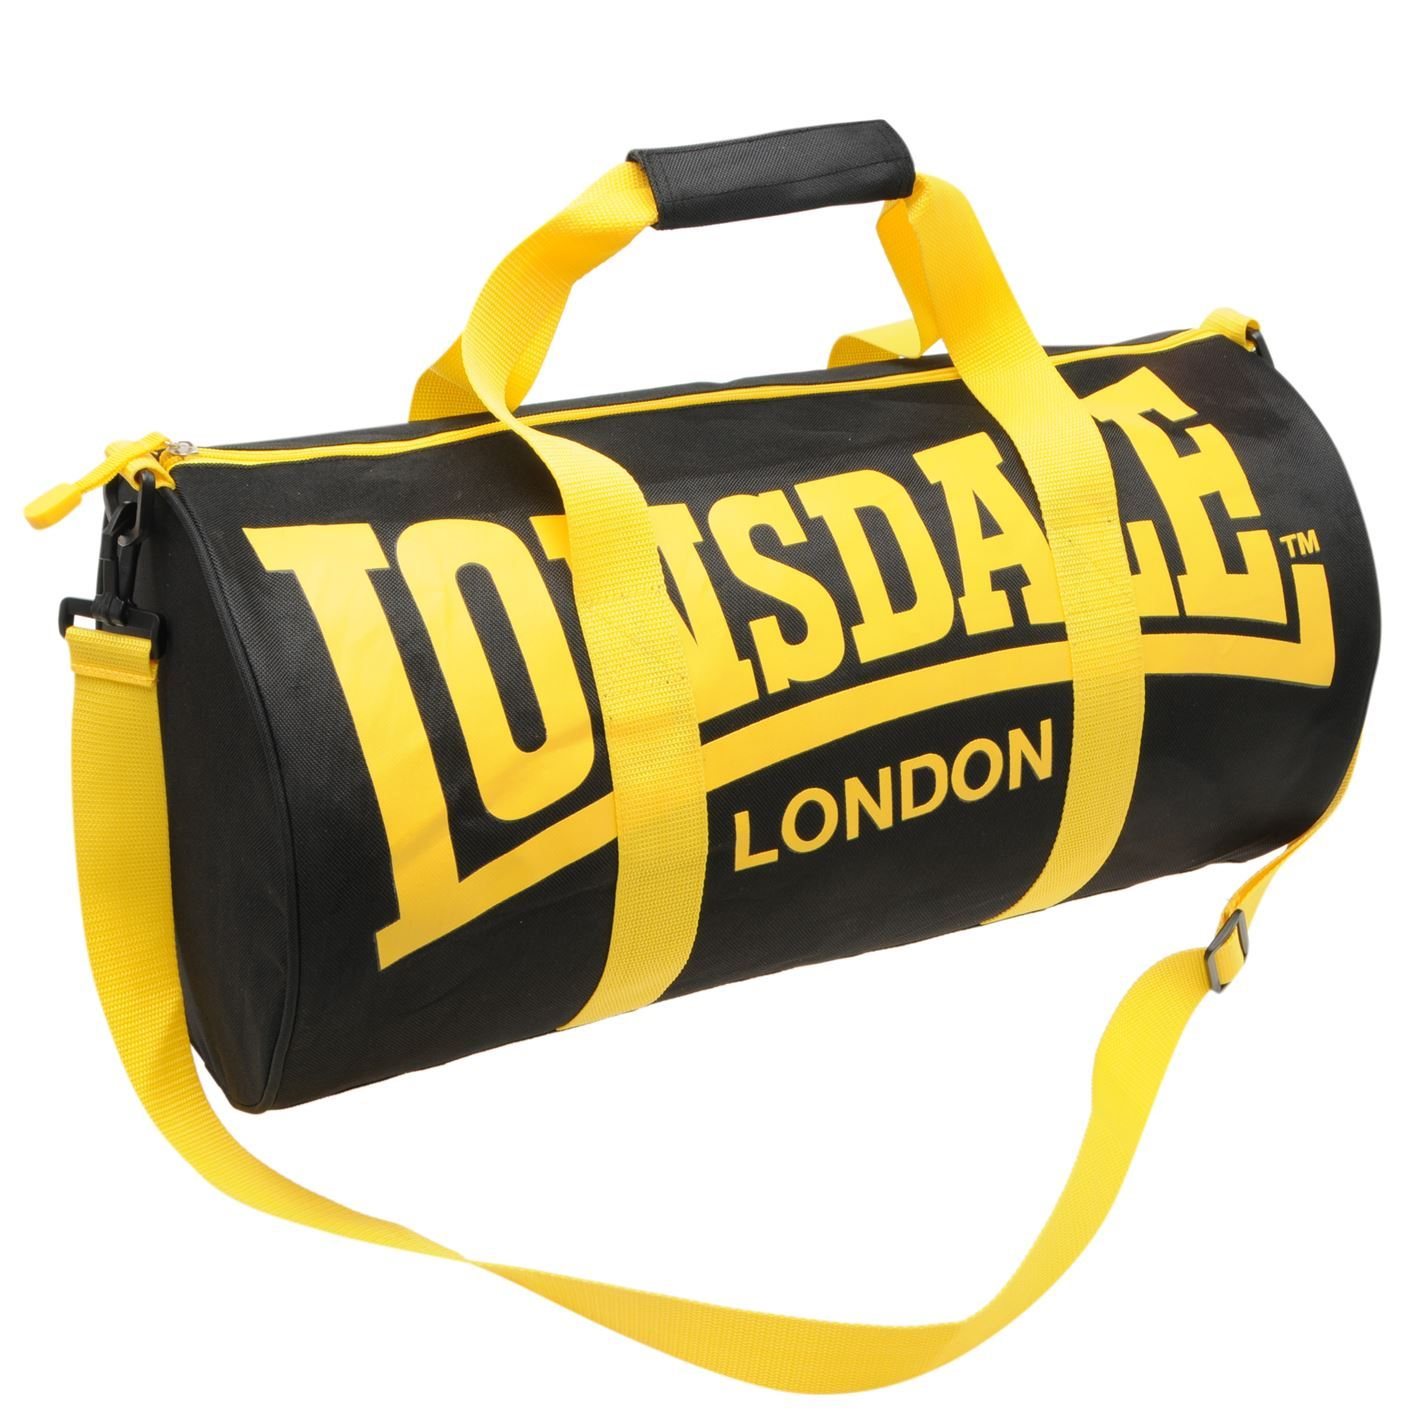 ... Lonsdale Barrel Bag Black Yellow Sports Kit Holdall Carryall Gymbag ... 12cec0628488e